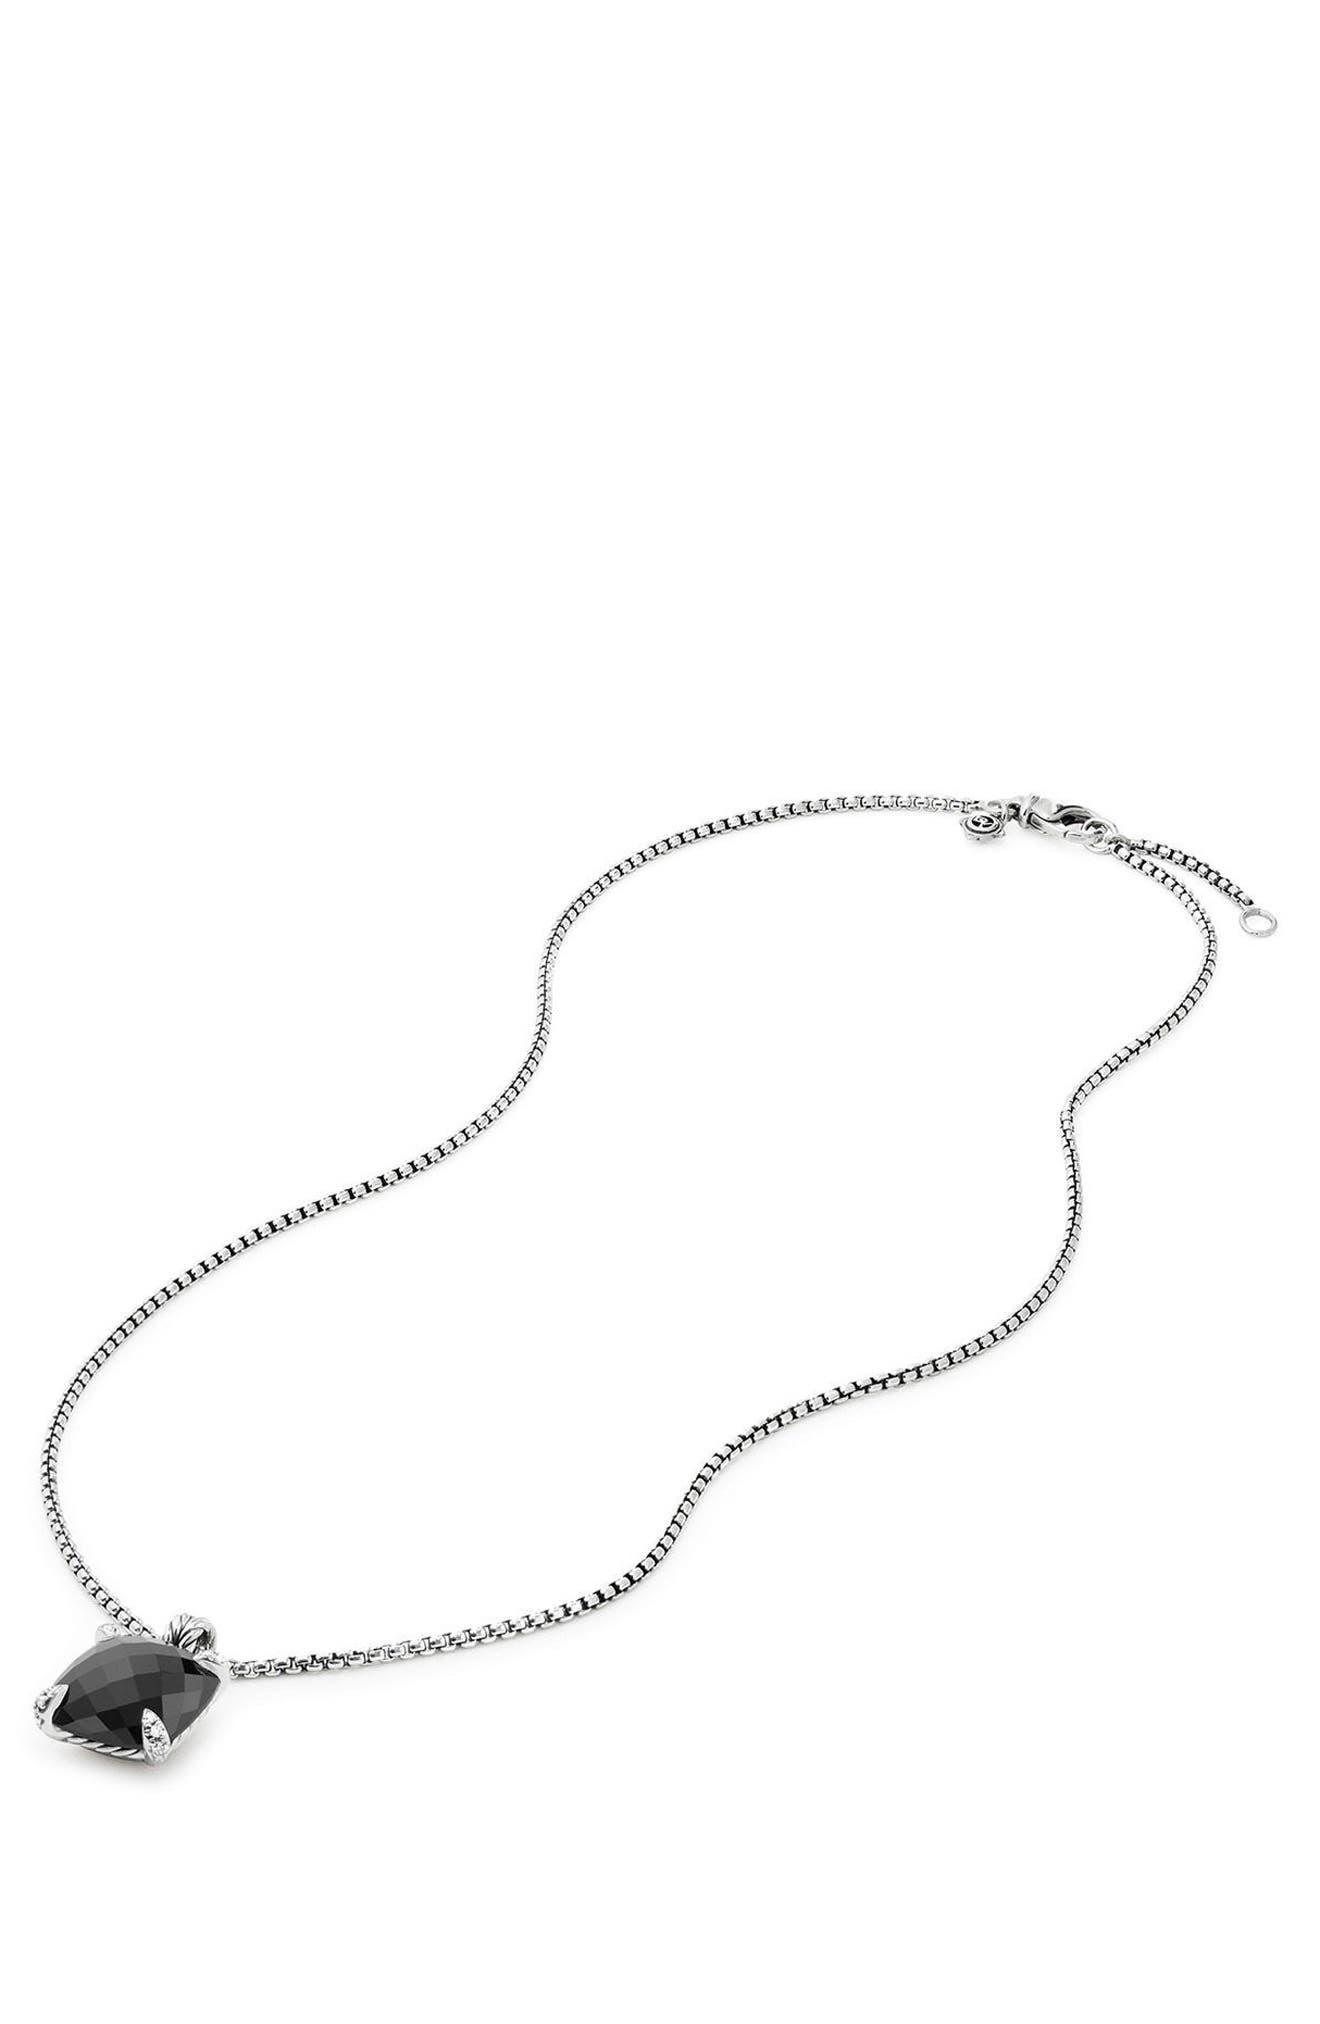 DAVID YURMAN,                             Châtelaine Pendant Necklace with Diamonds,                             Alternate thumbnail 3, color,                             BLACK ONYX?